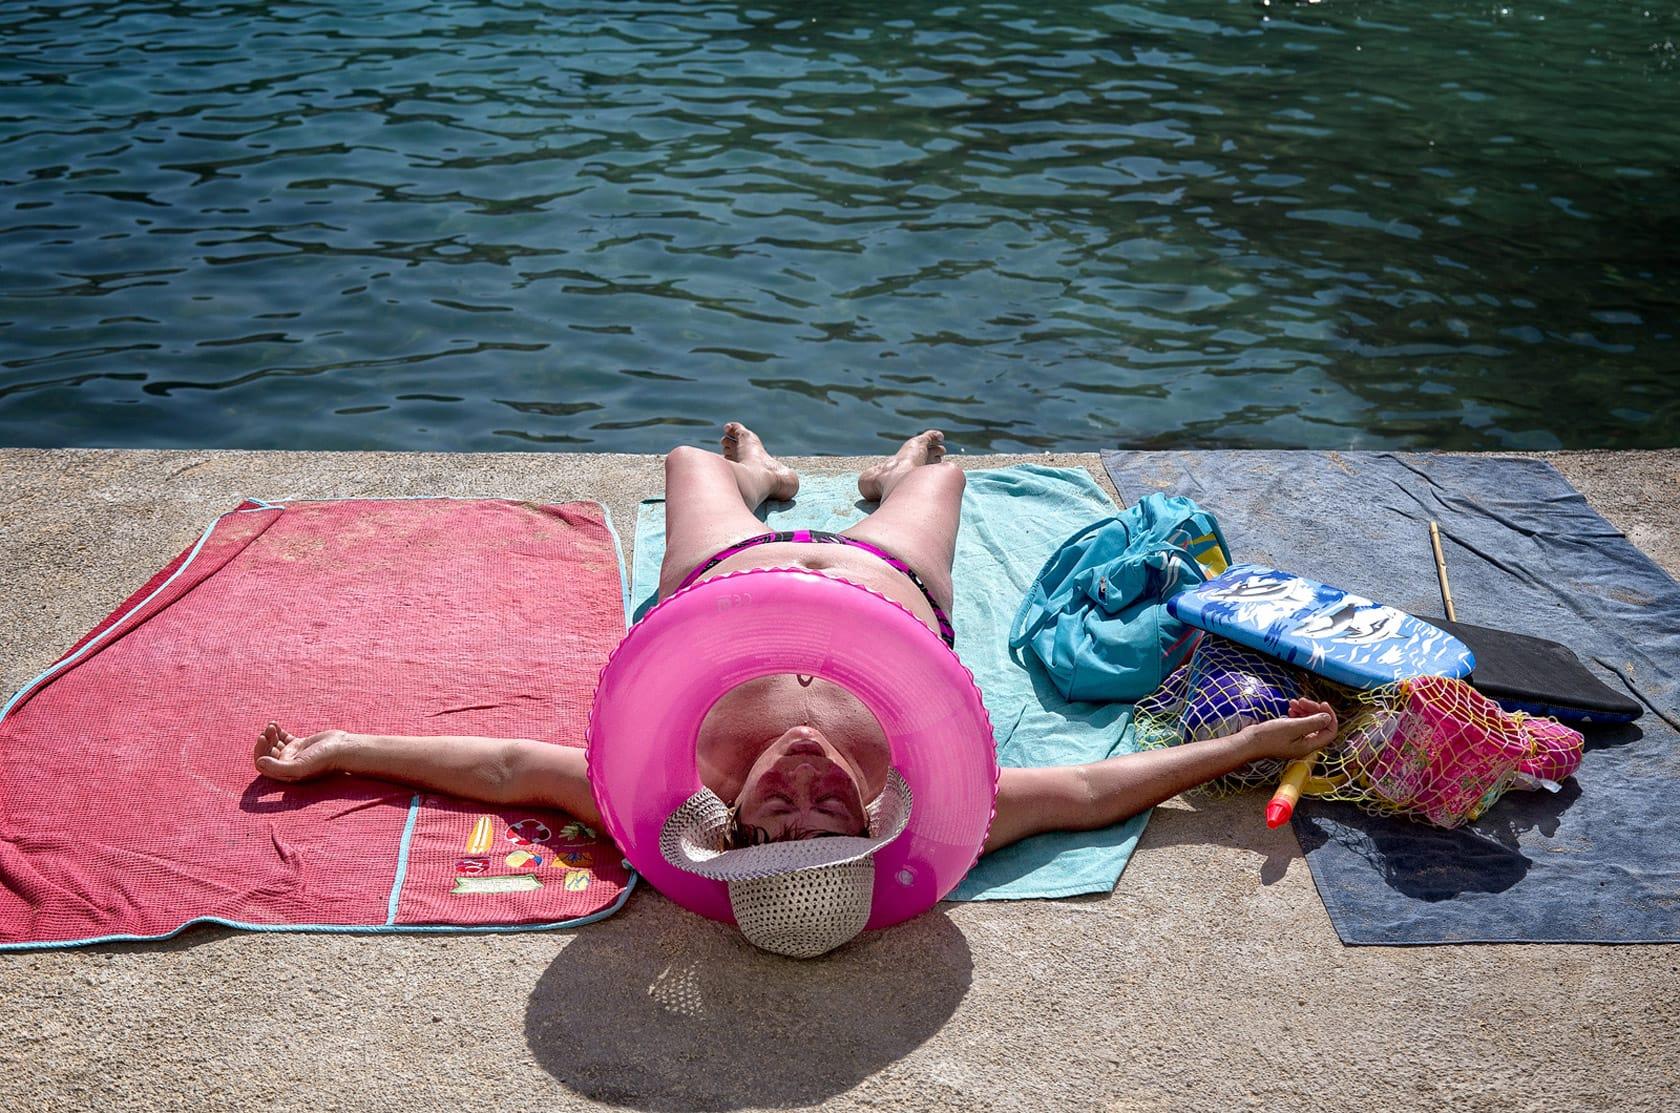 Lorenzo Grifantini Beach Street Photography 3